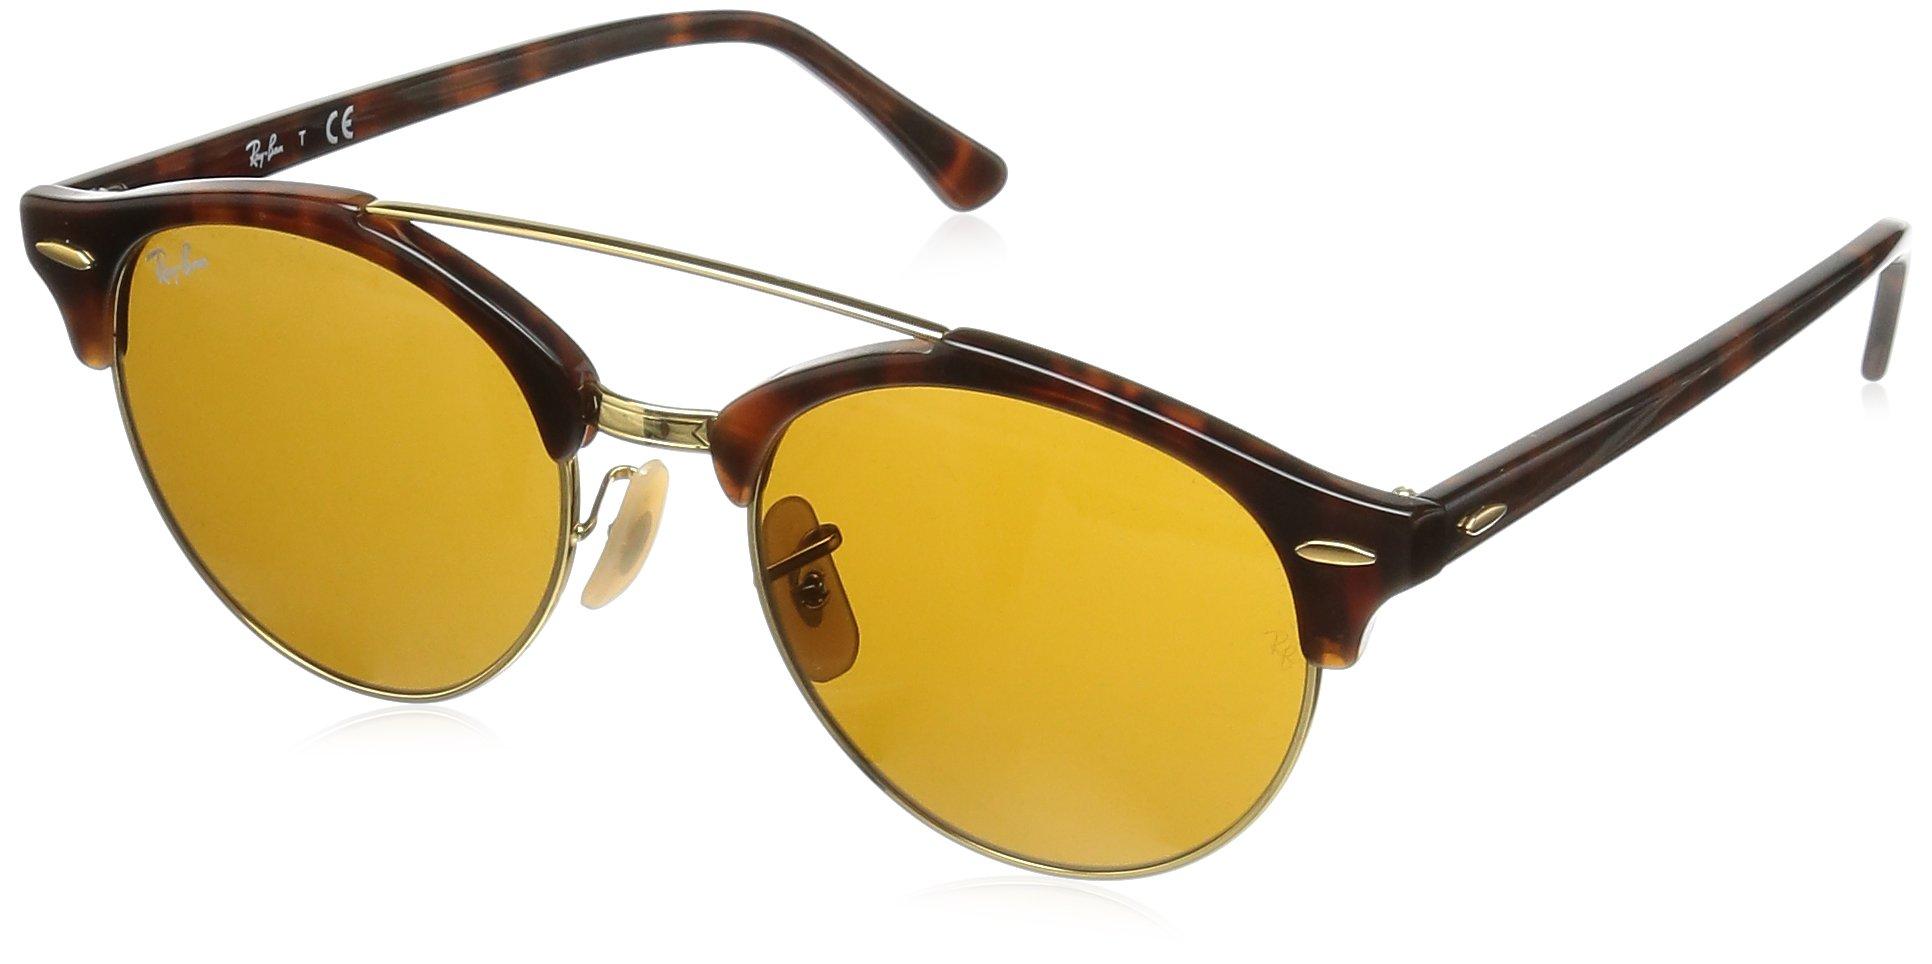 Ray-Ban Clubround Double Bridge Sunglasses (RB4346) Tortoise/Brown Plastic - Non-Polarized - 51mm